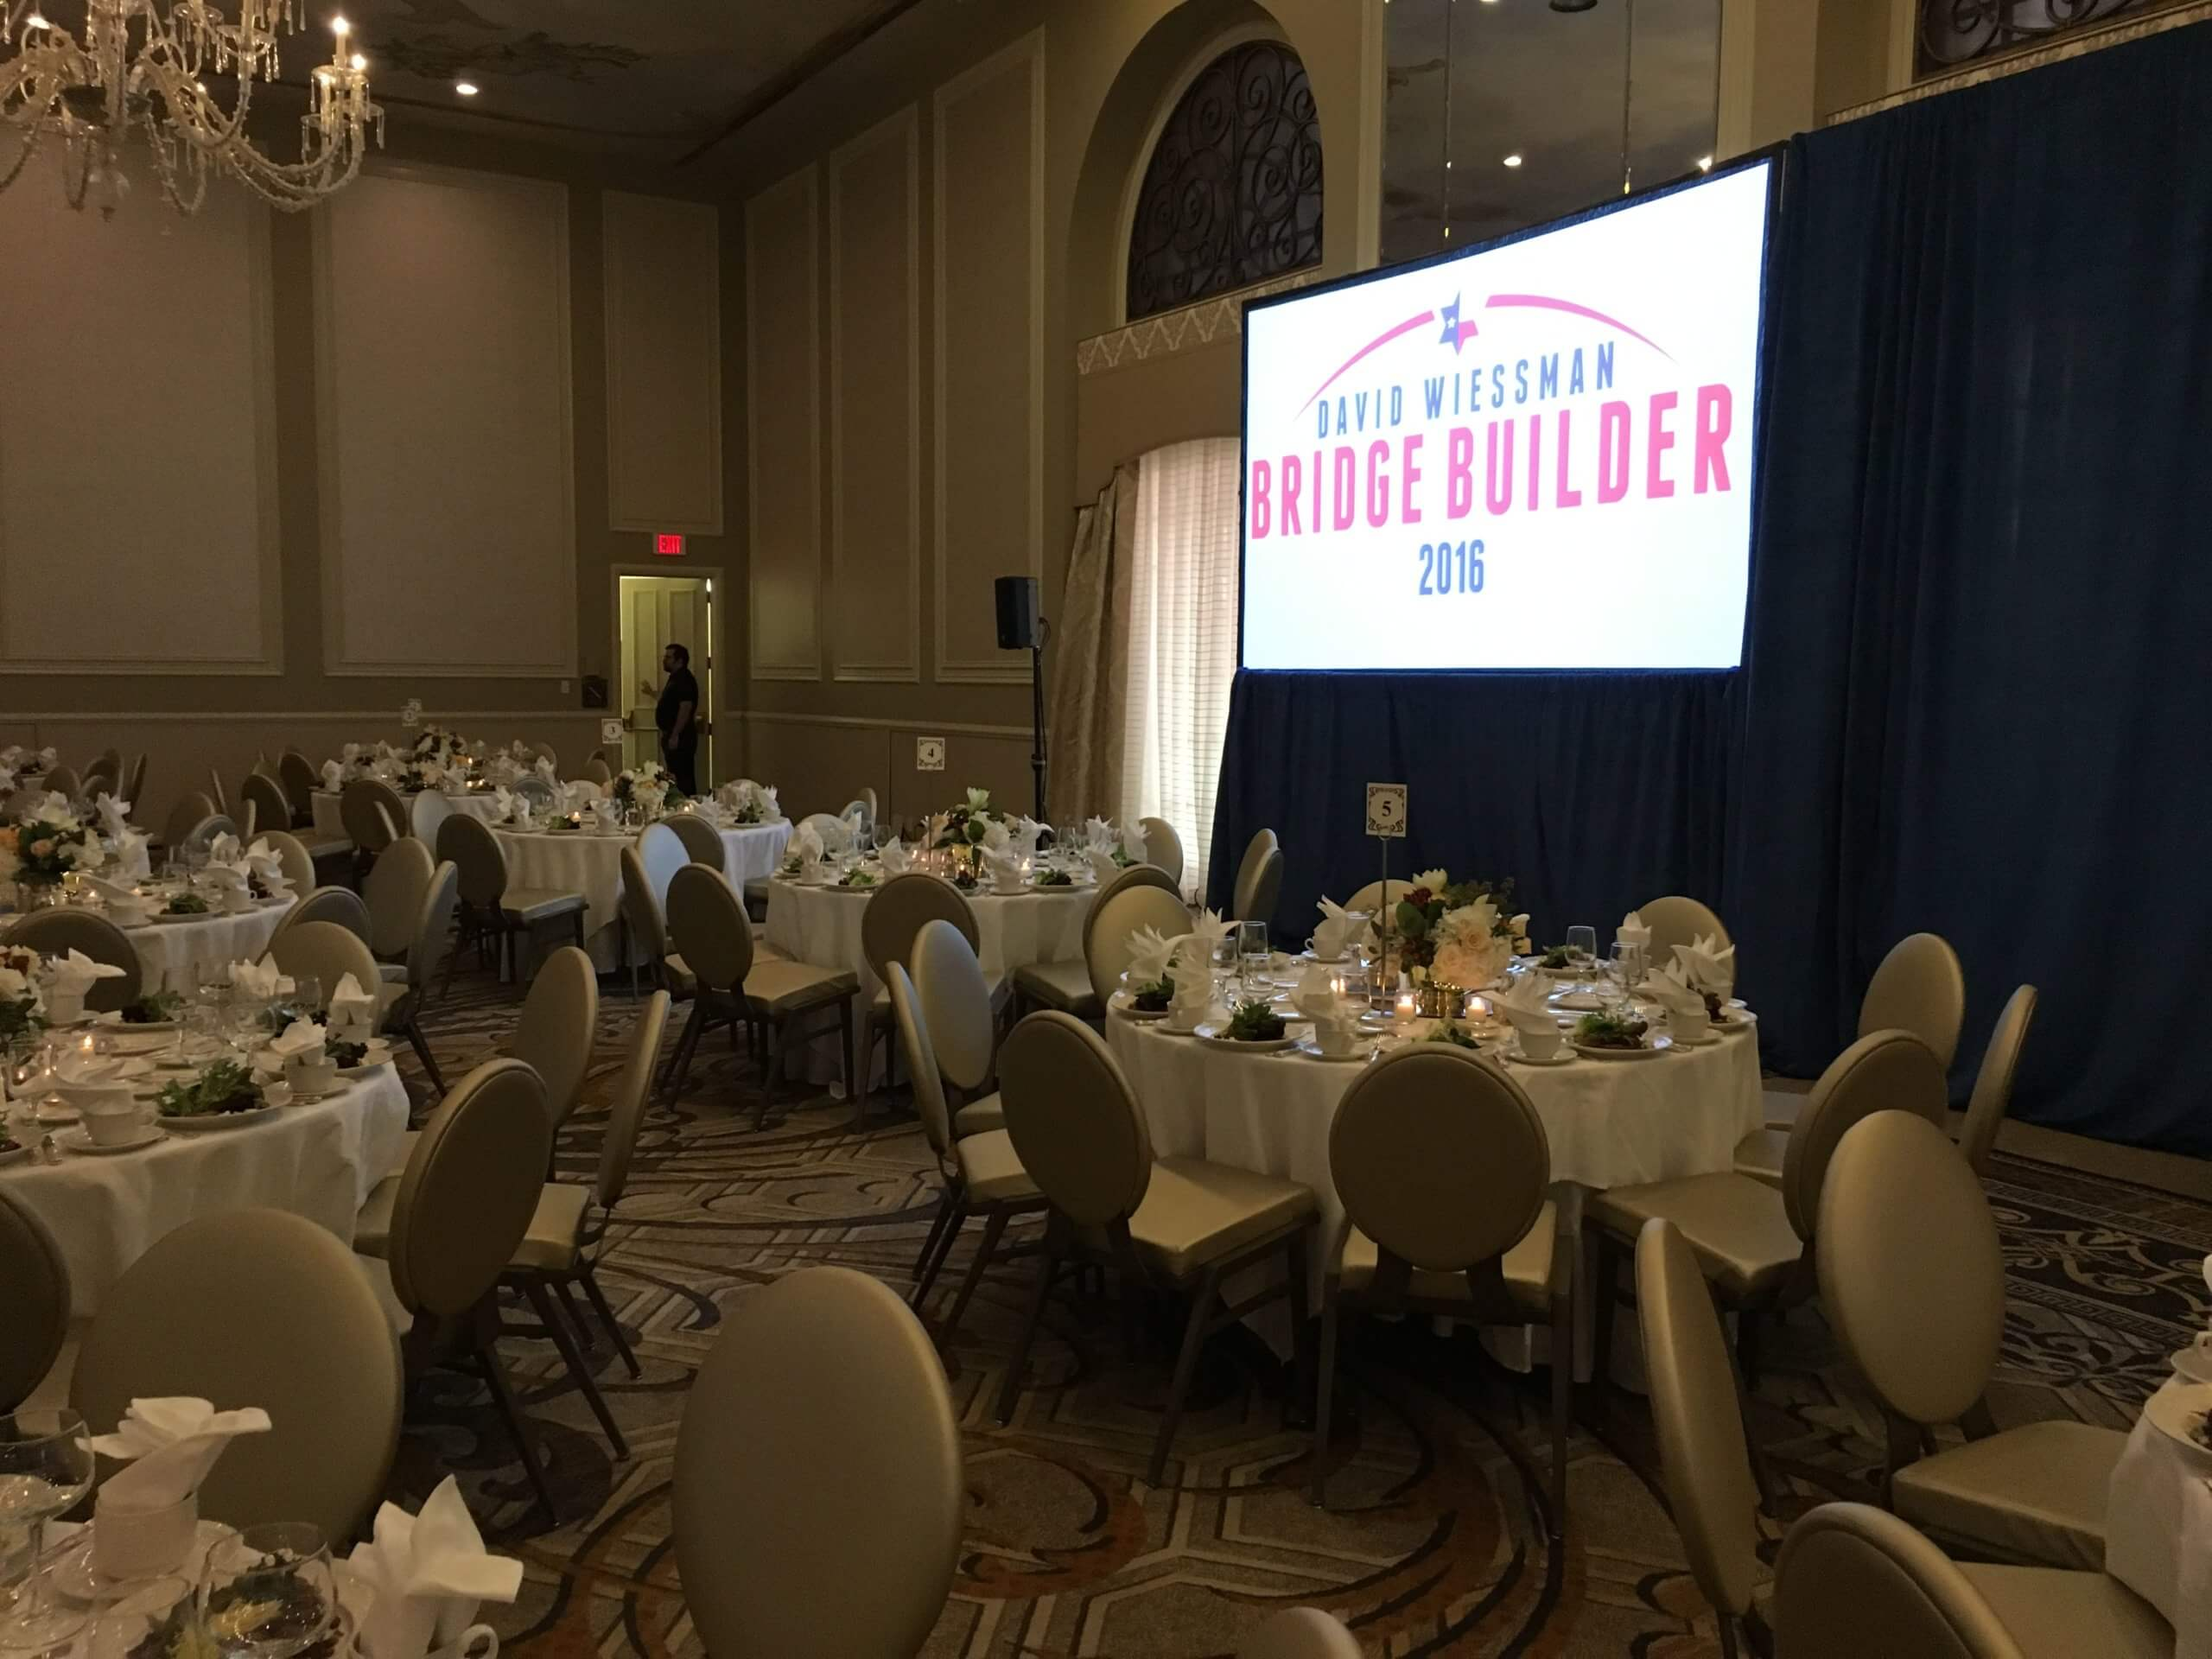 David Wiessman Bridge Builder Award Gala 4